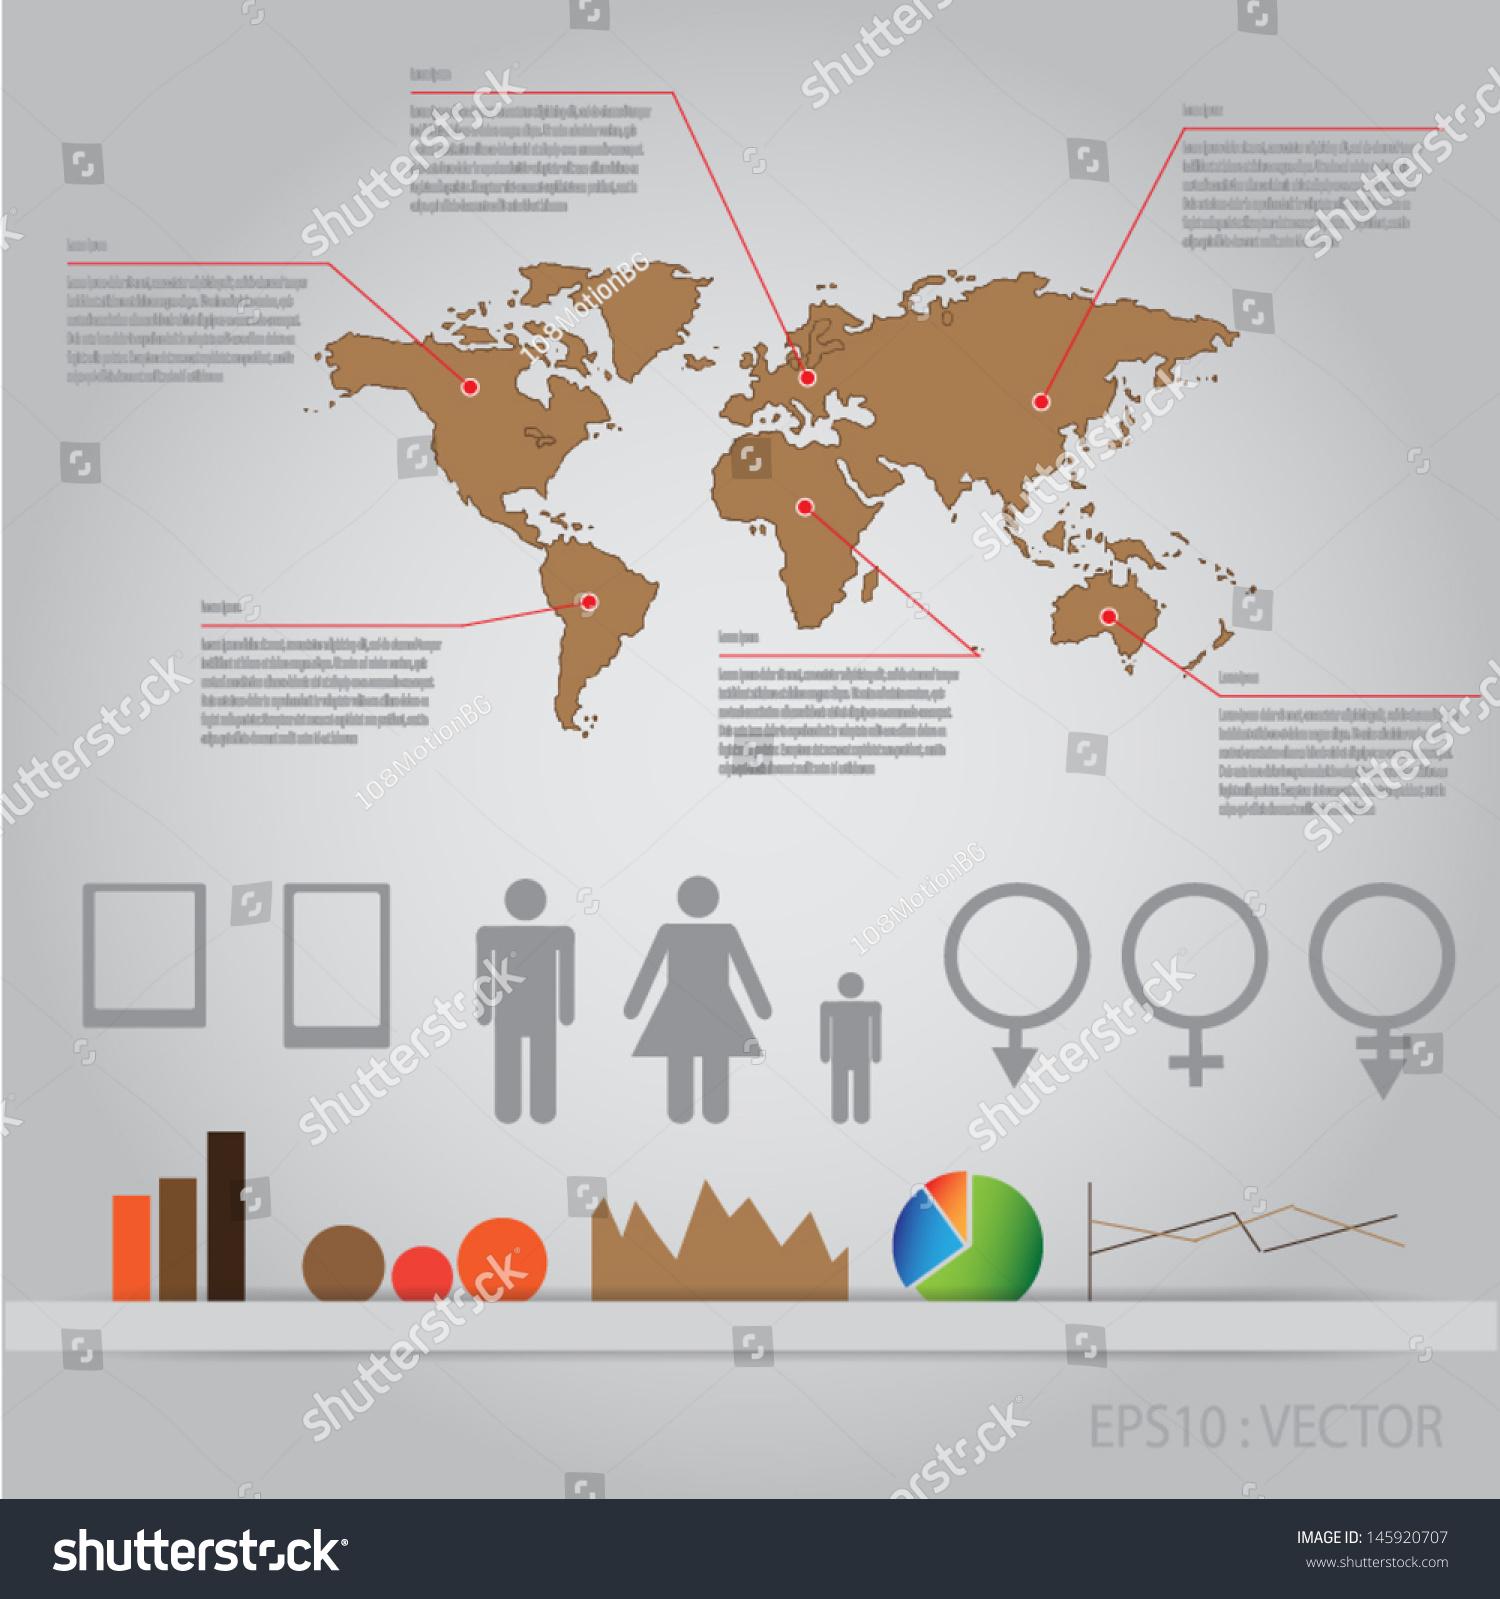 Infographics world map man woman graphvector stock vector infographics world map with man woman graphvector gumiabroncs Gallery